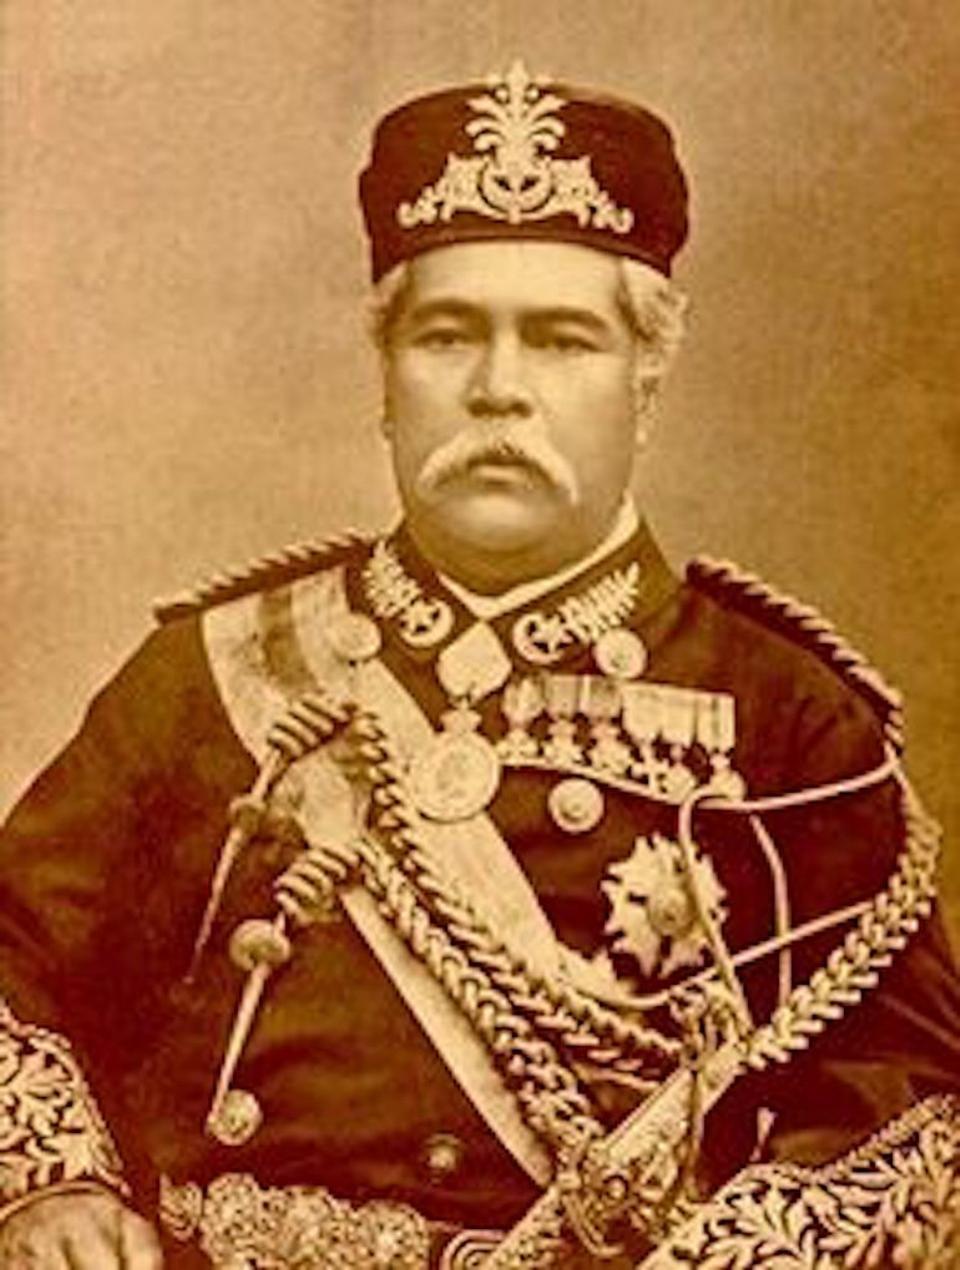 Sultan Abu Bakar of Johor, first sultan of modern-day Johor.